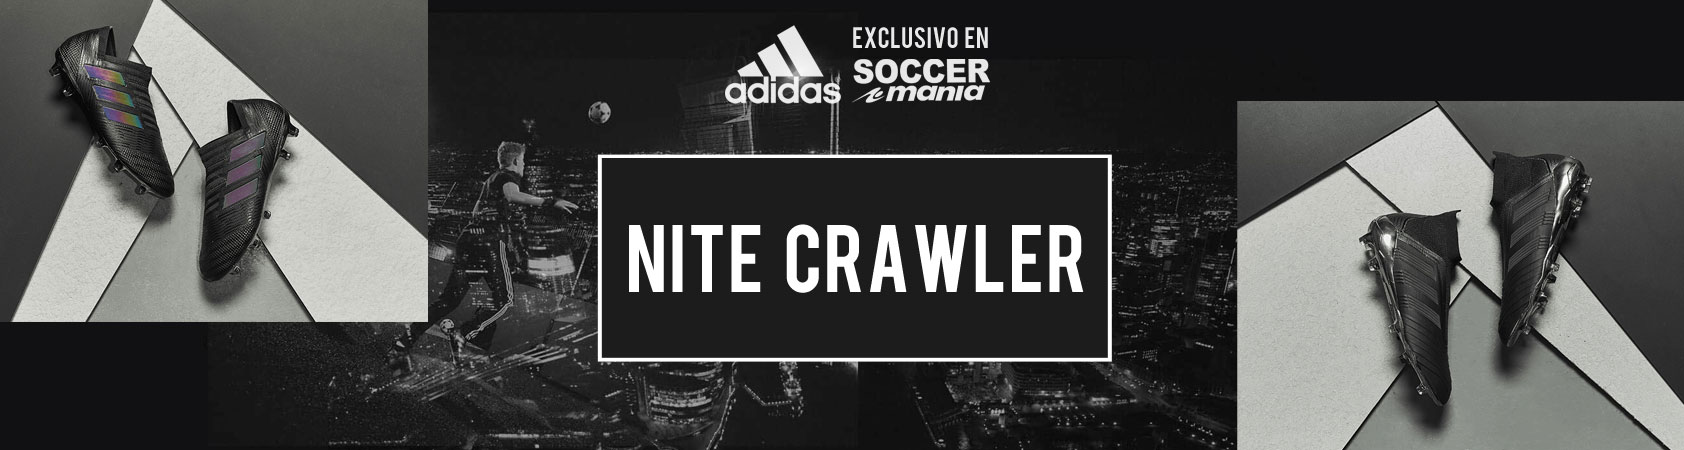 NITE CRAWLER